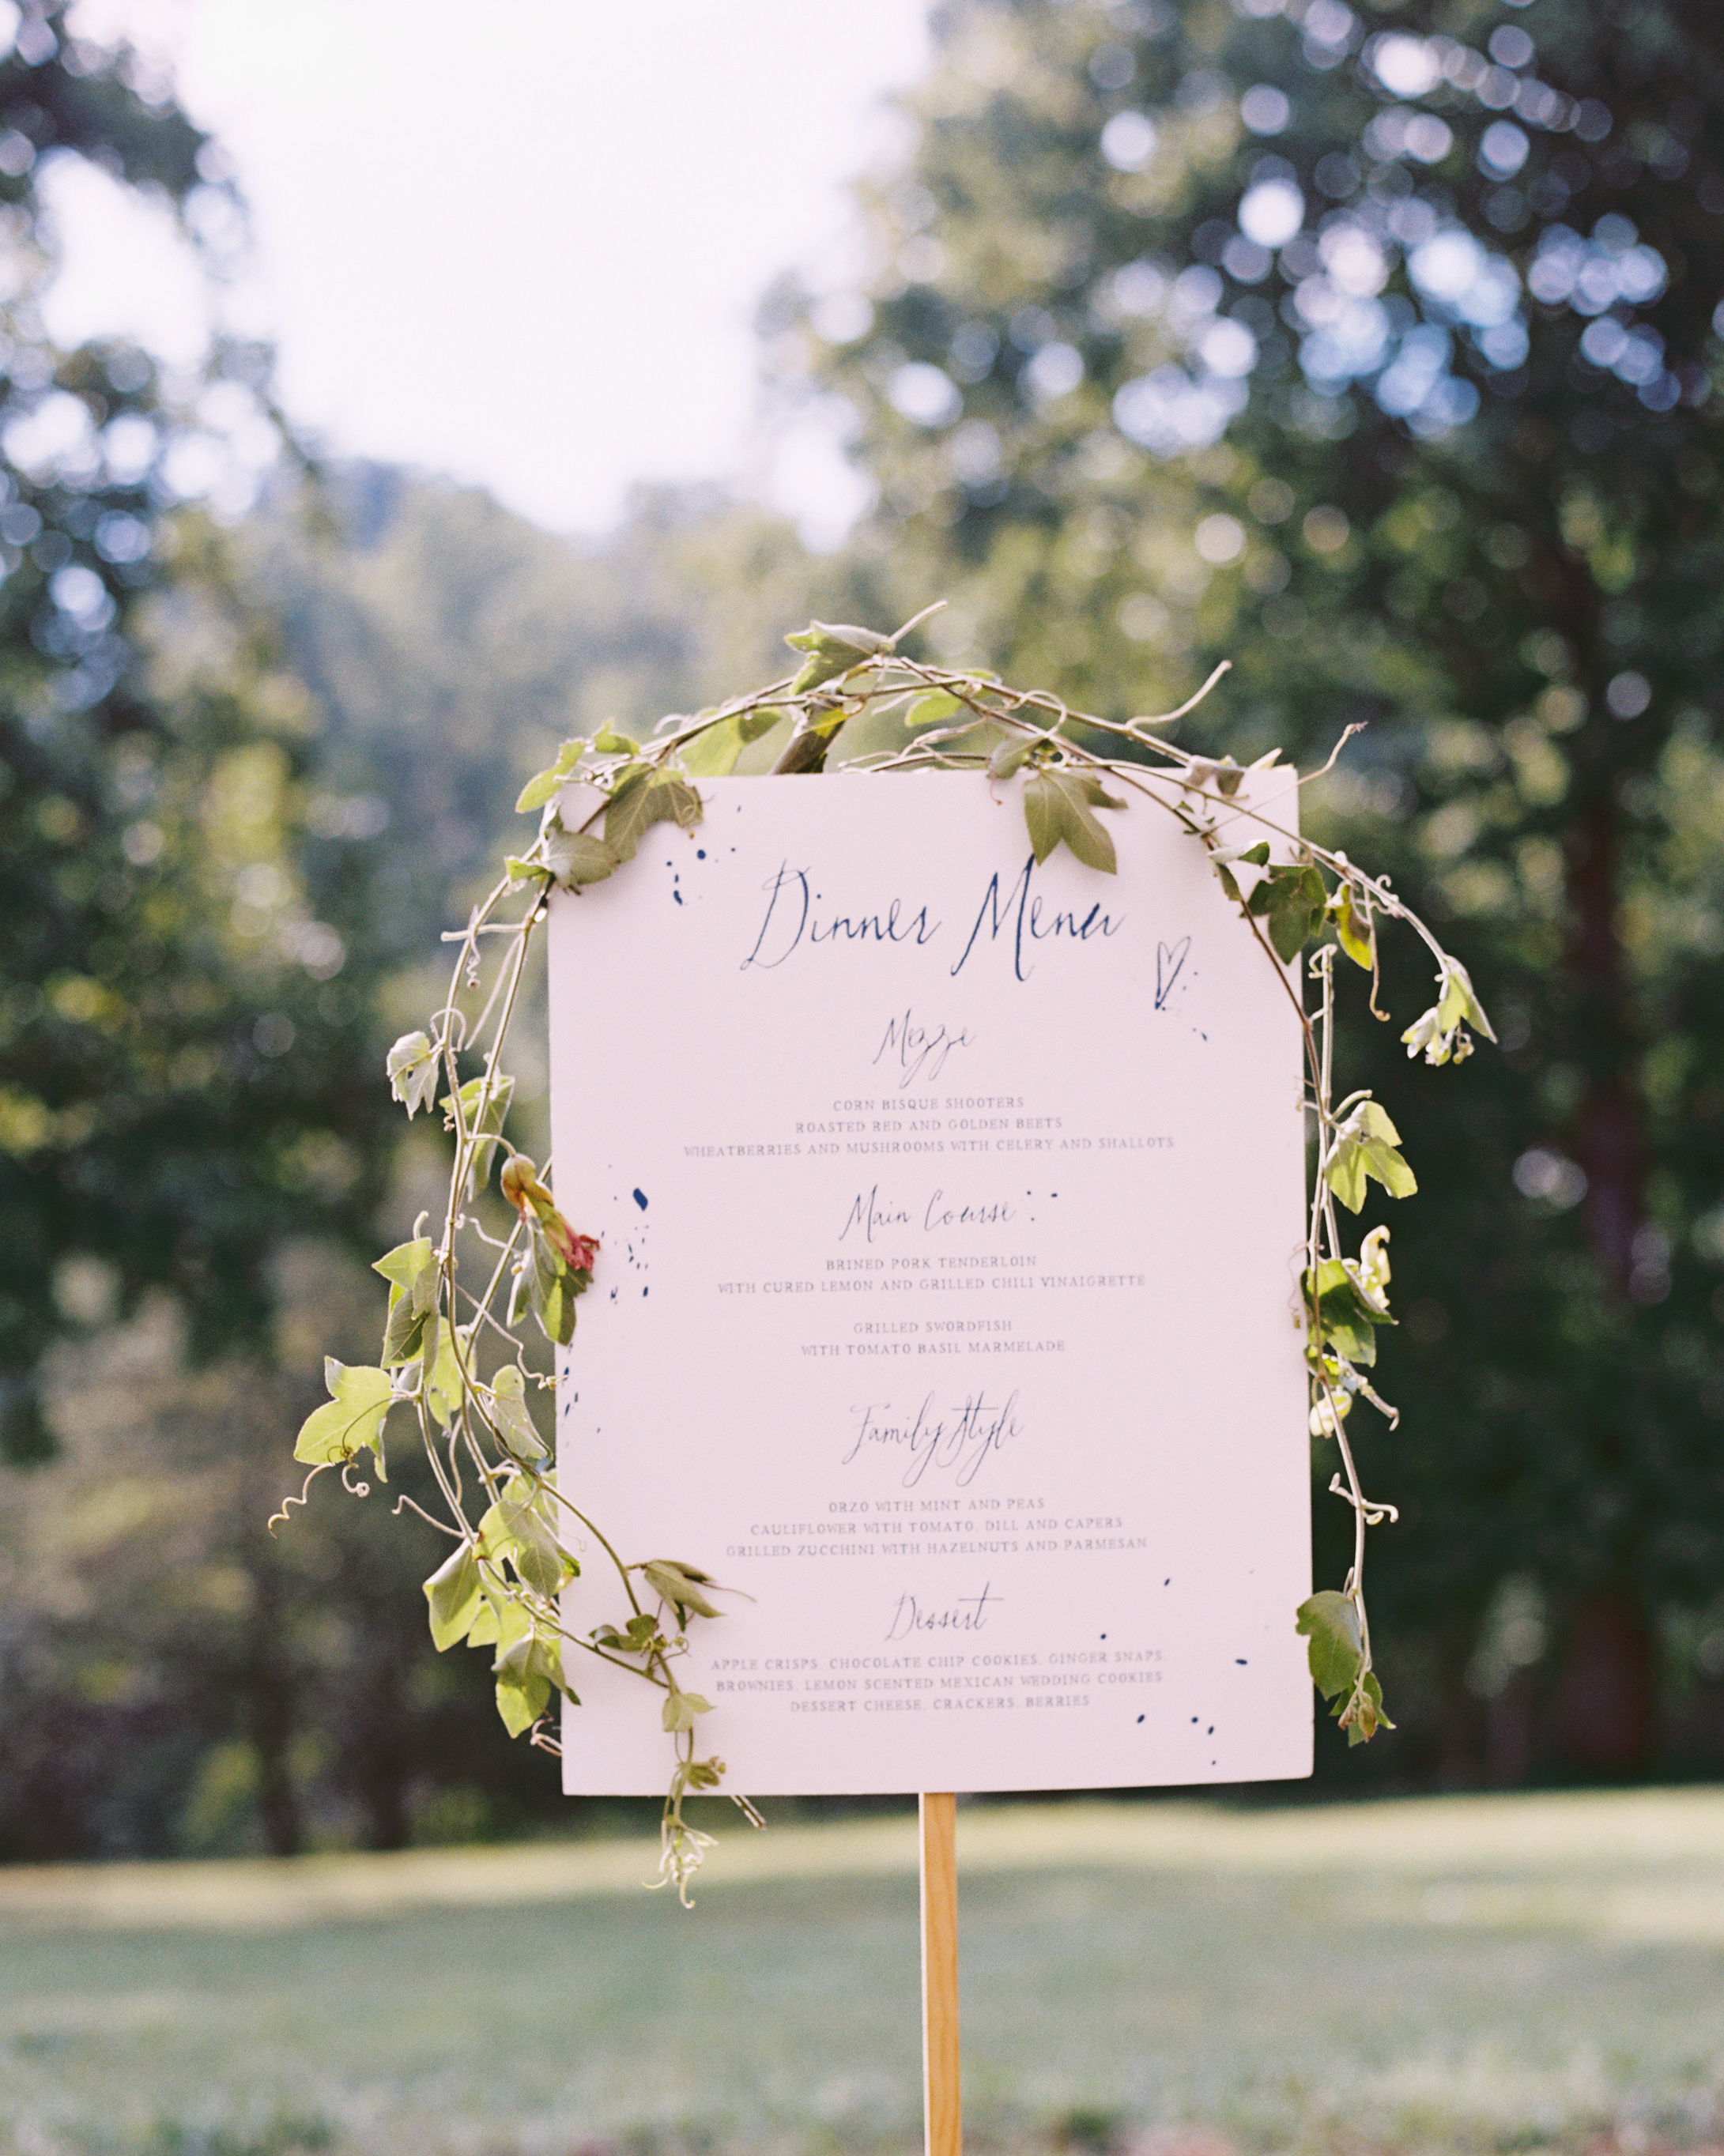 michelle-john-wedding-north-carolina-11-s111840-0215.jpg